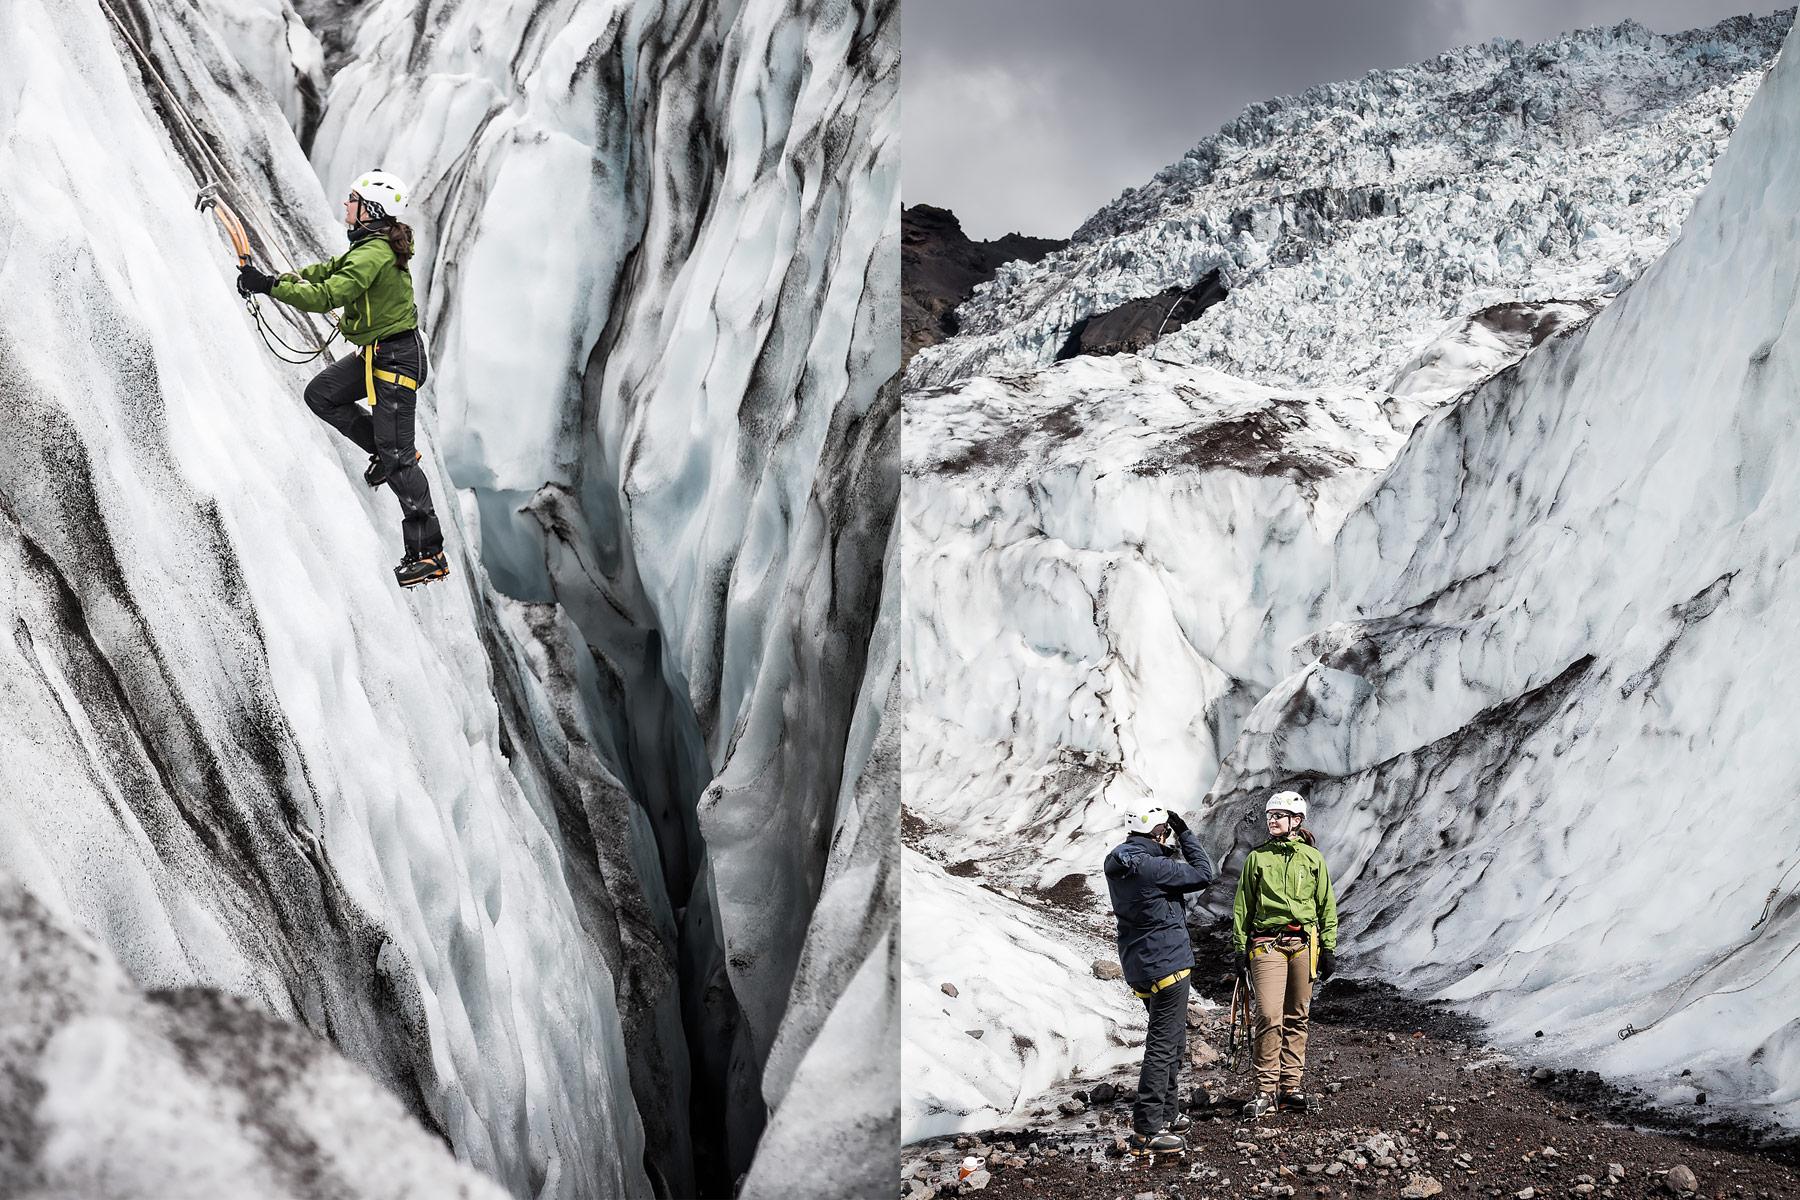 glaciericeclimbingiceland2.jpg